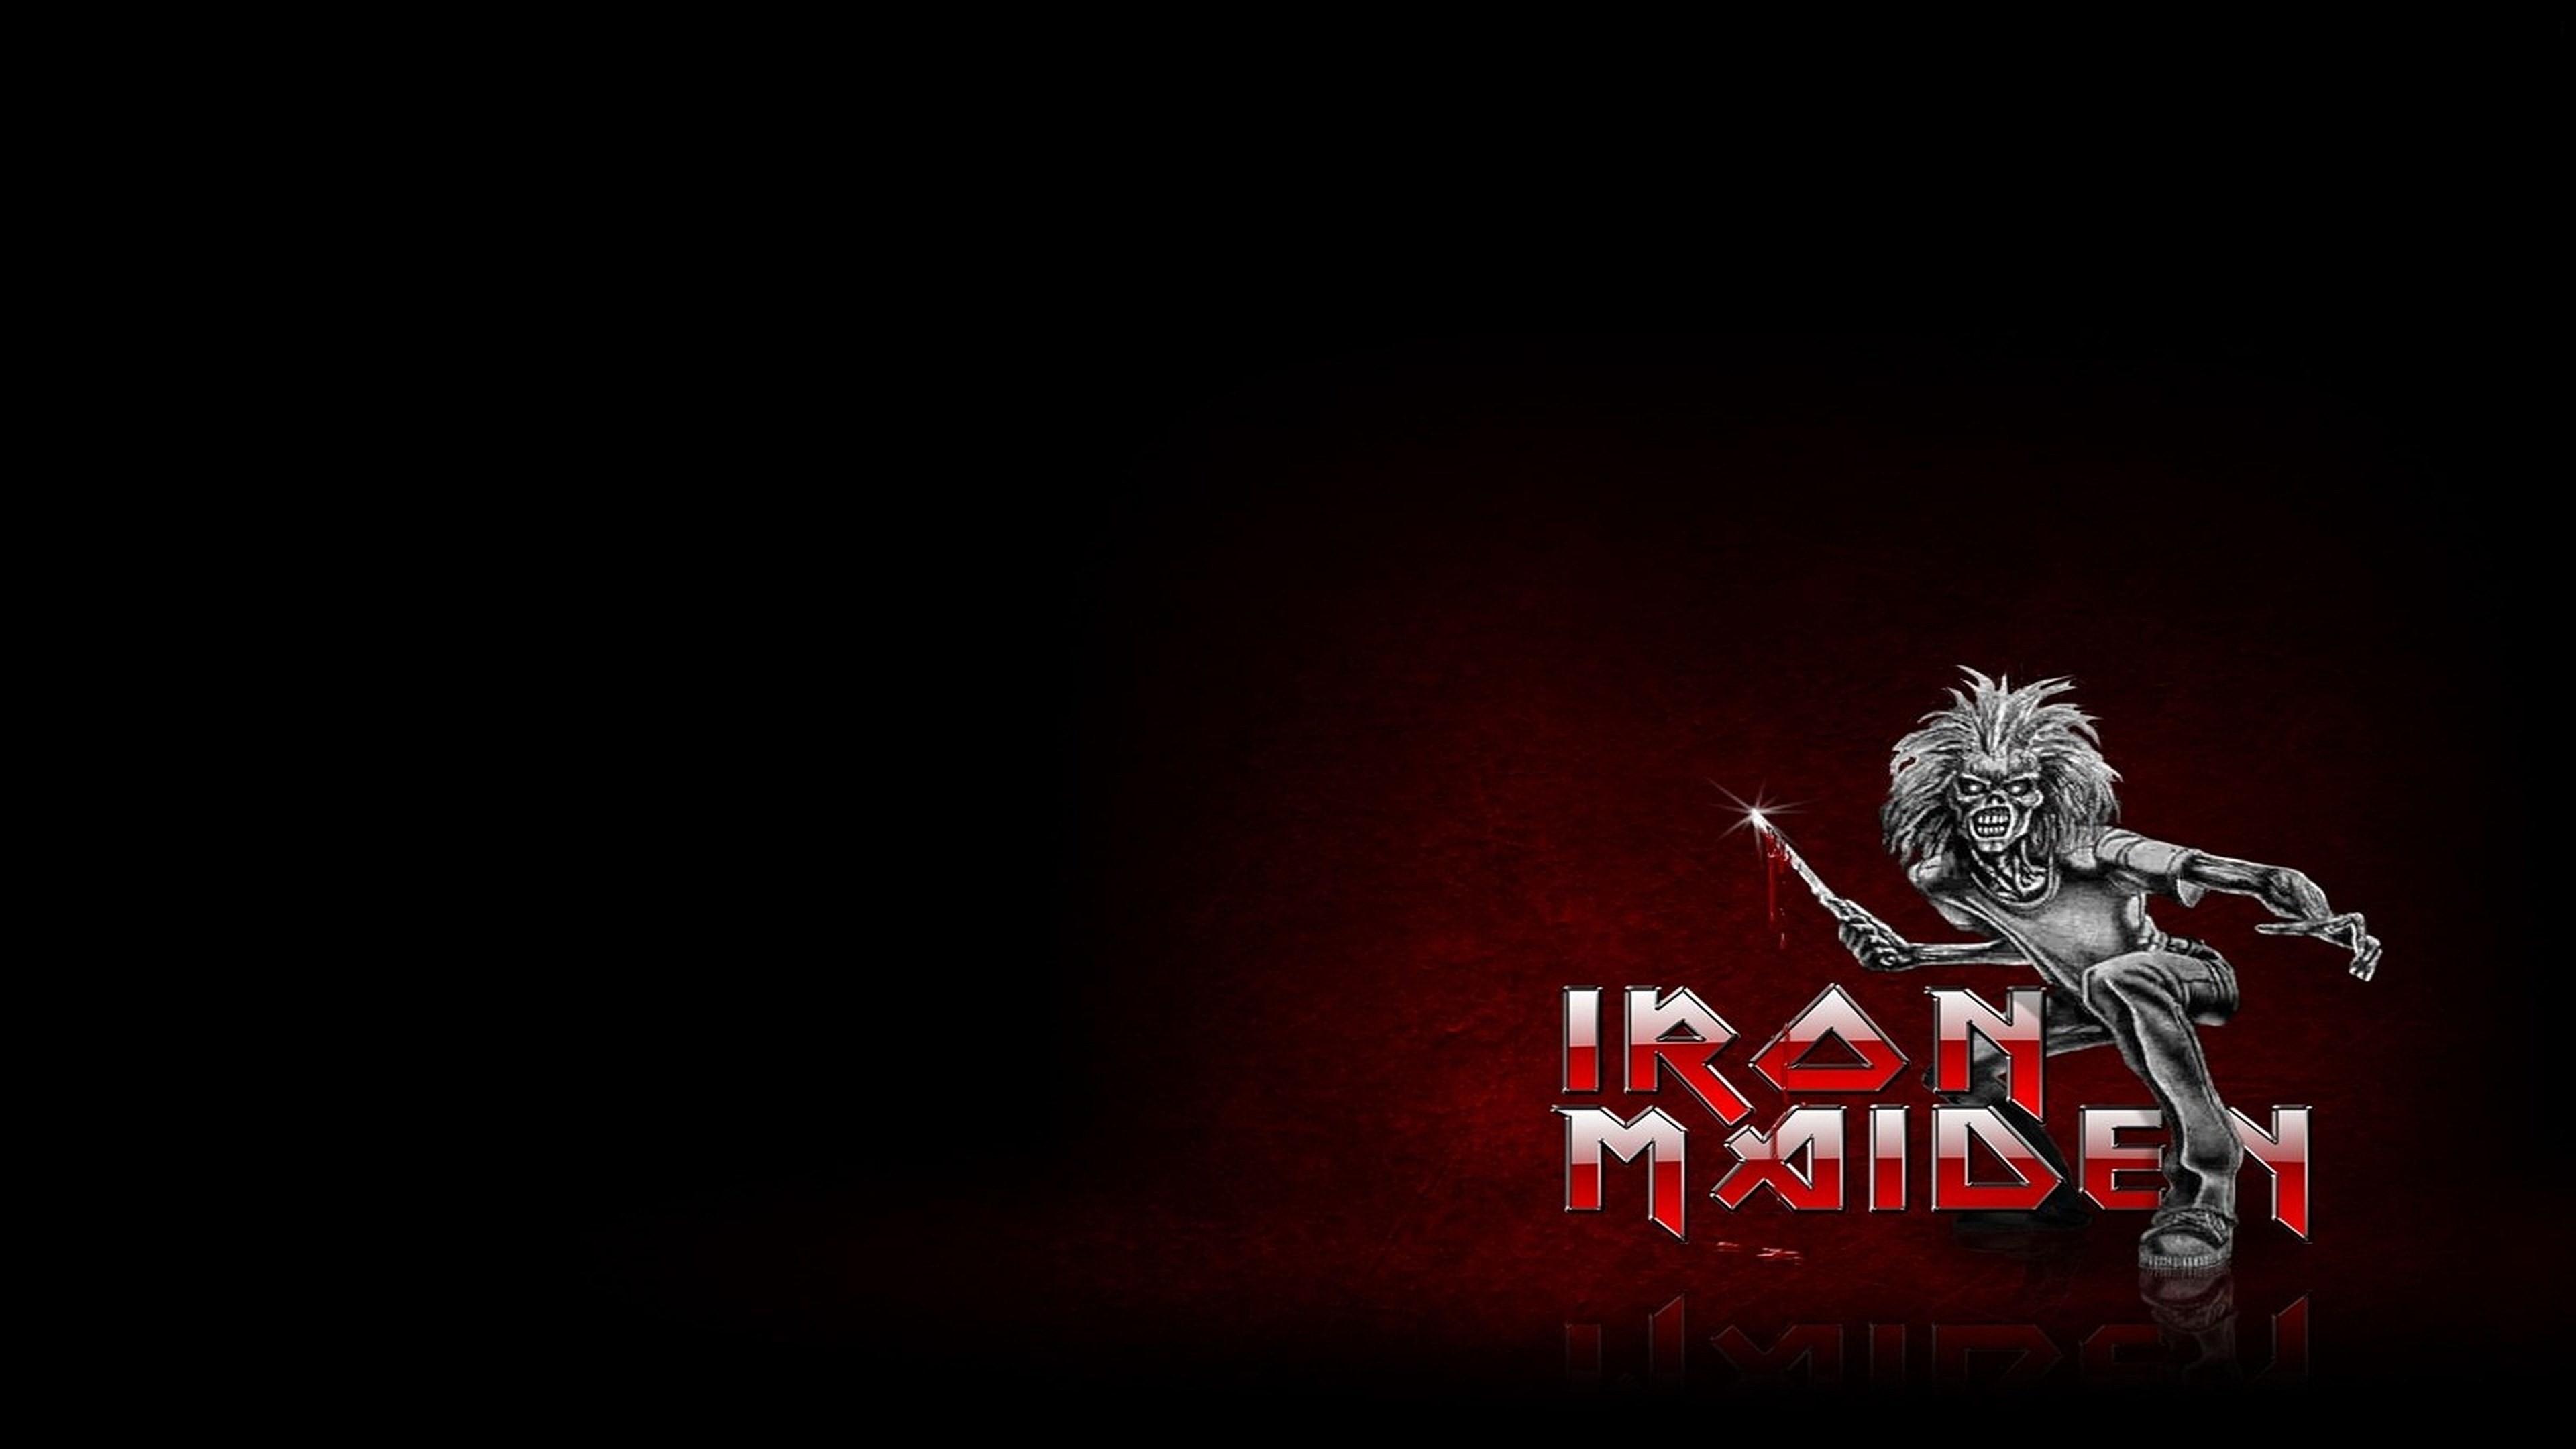 Iron Maiden Wallpaper Widescreen (68+ images)